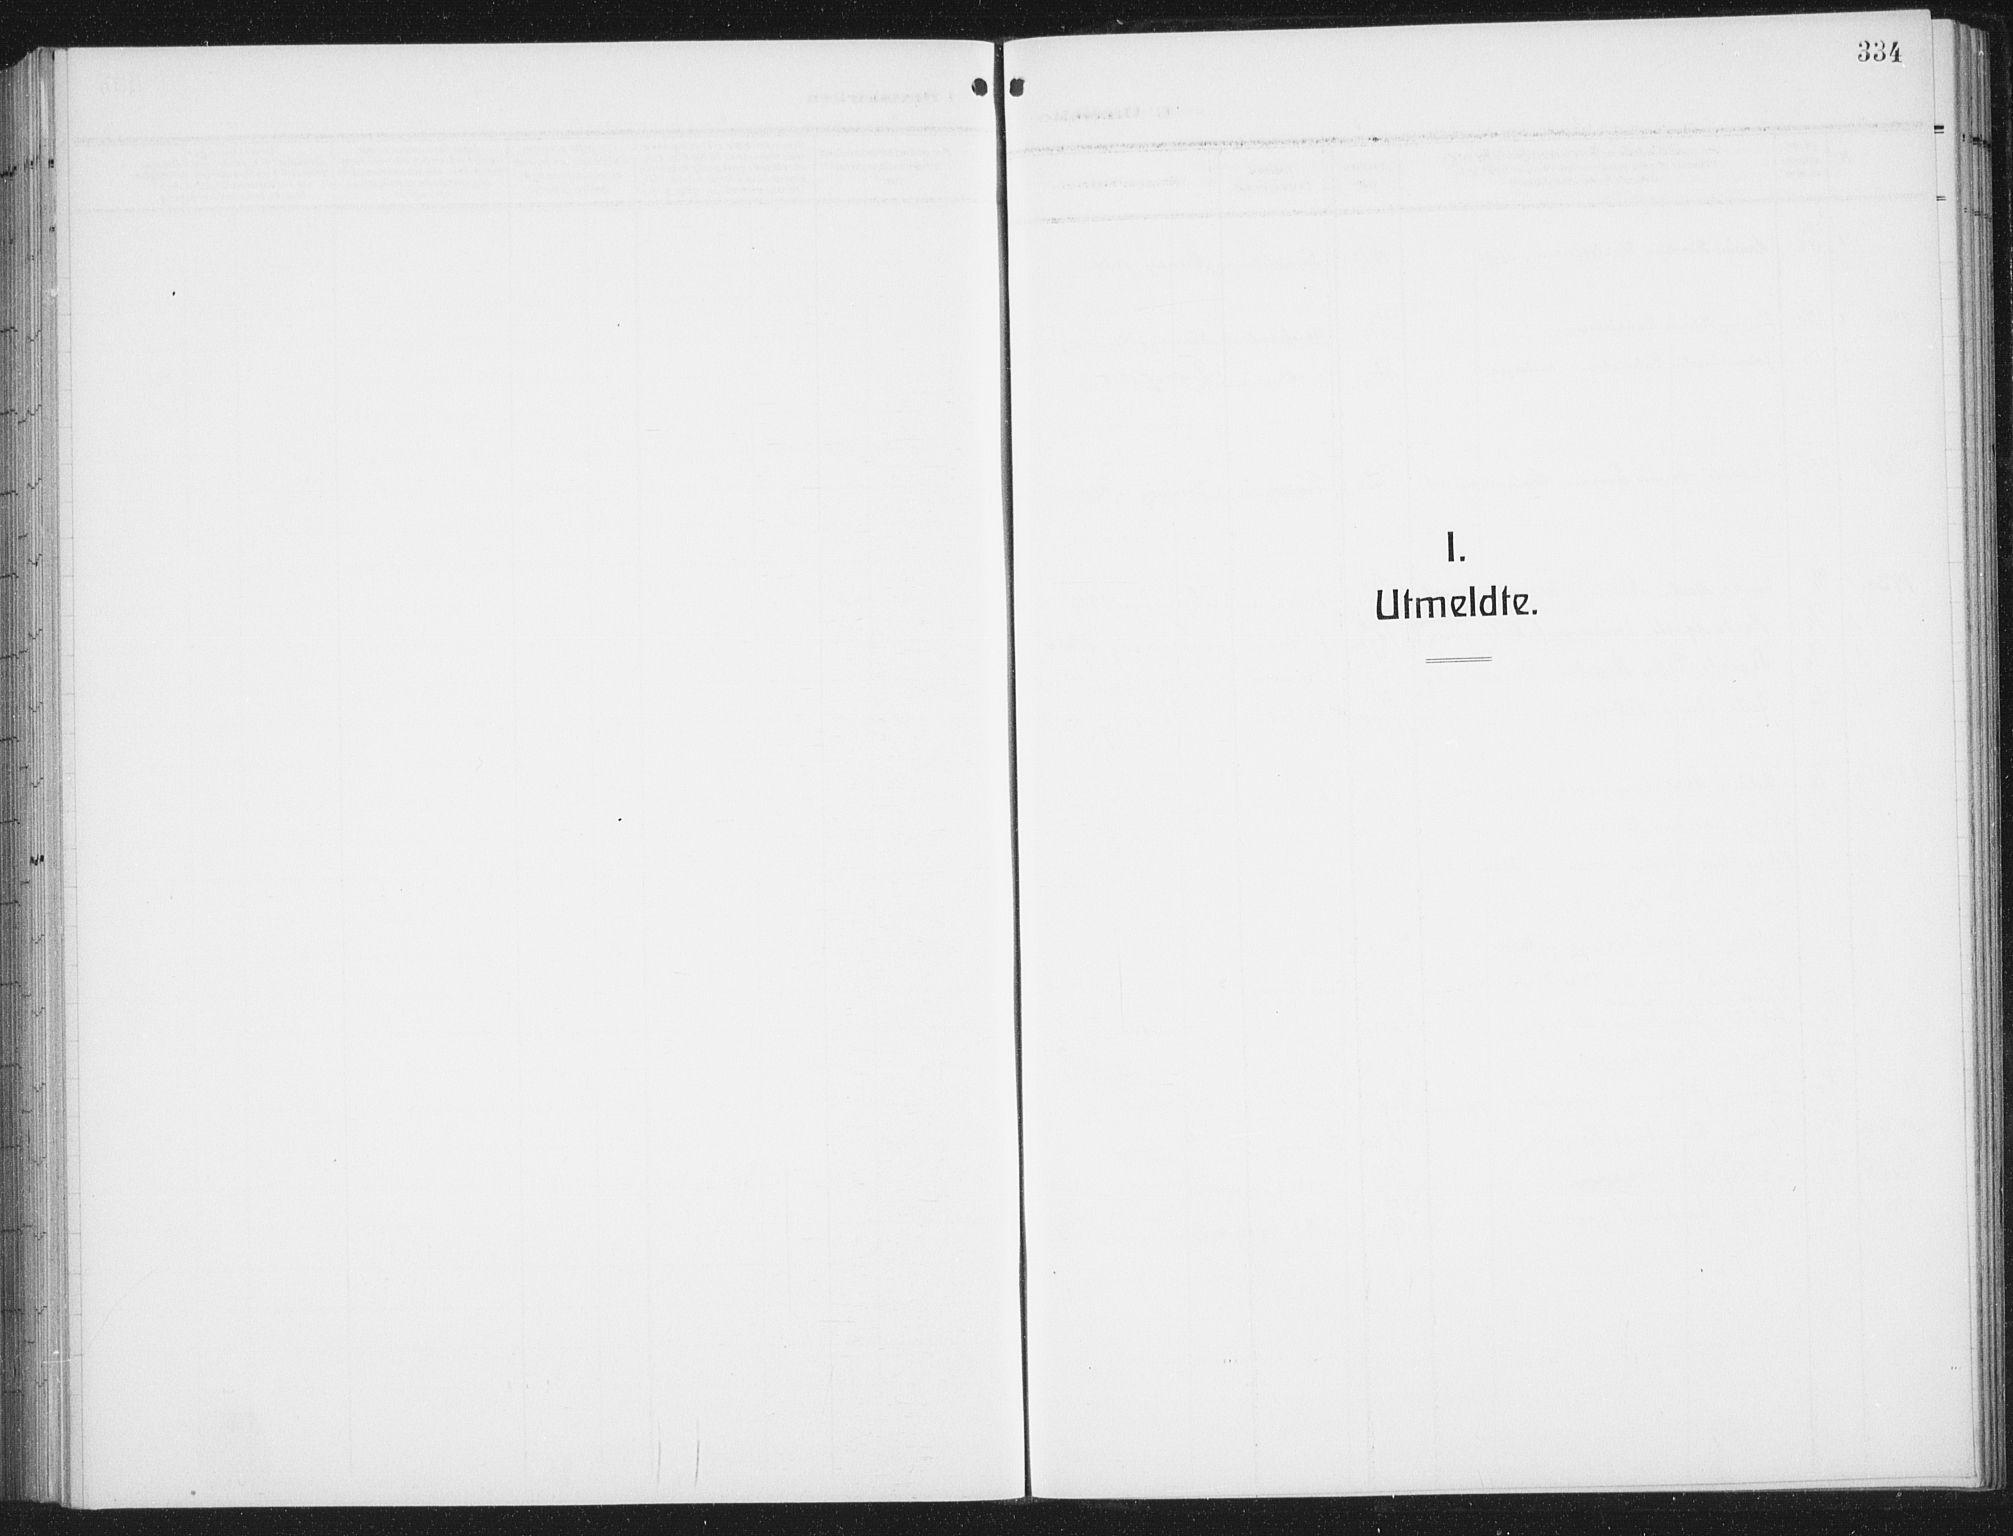 SAT, Ministerialprotokoller, klokkerbøker og fødselsregistre - Nordland, 876/L1106: Klokkerbok nr. 876C05, 1915-1942, s. 334